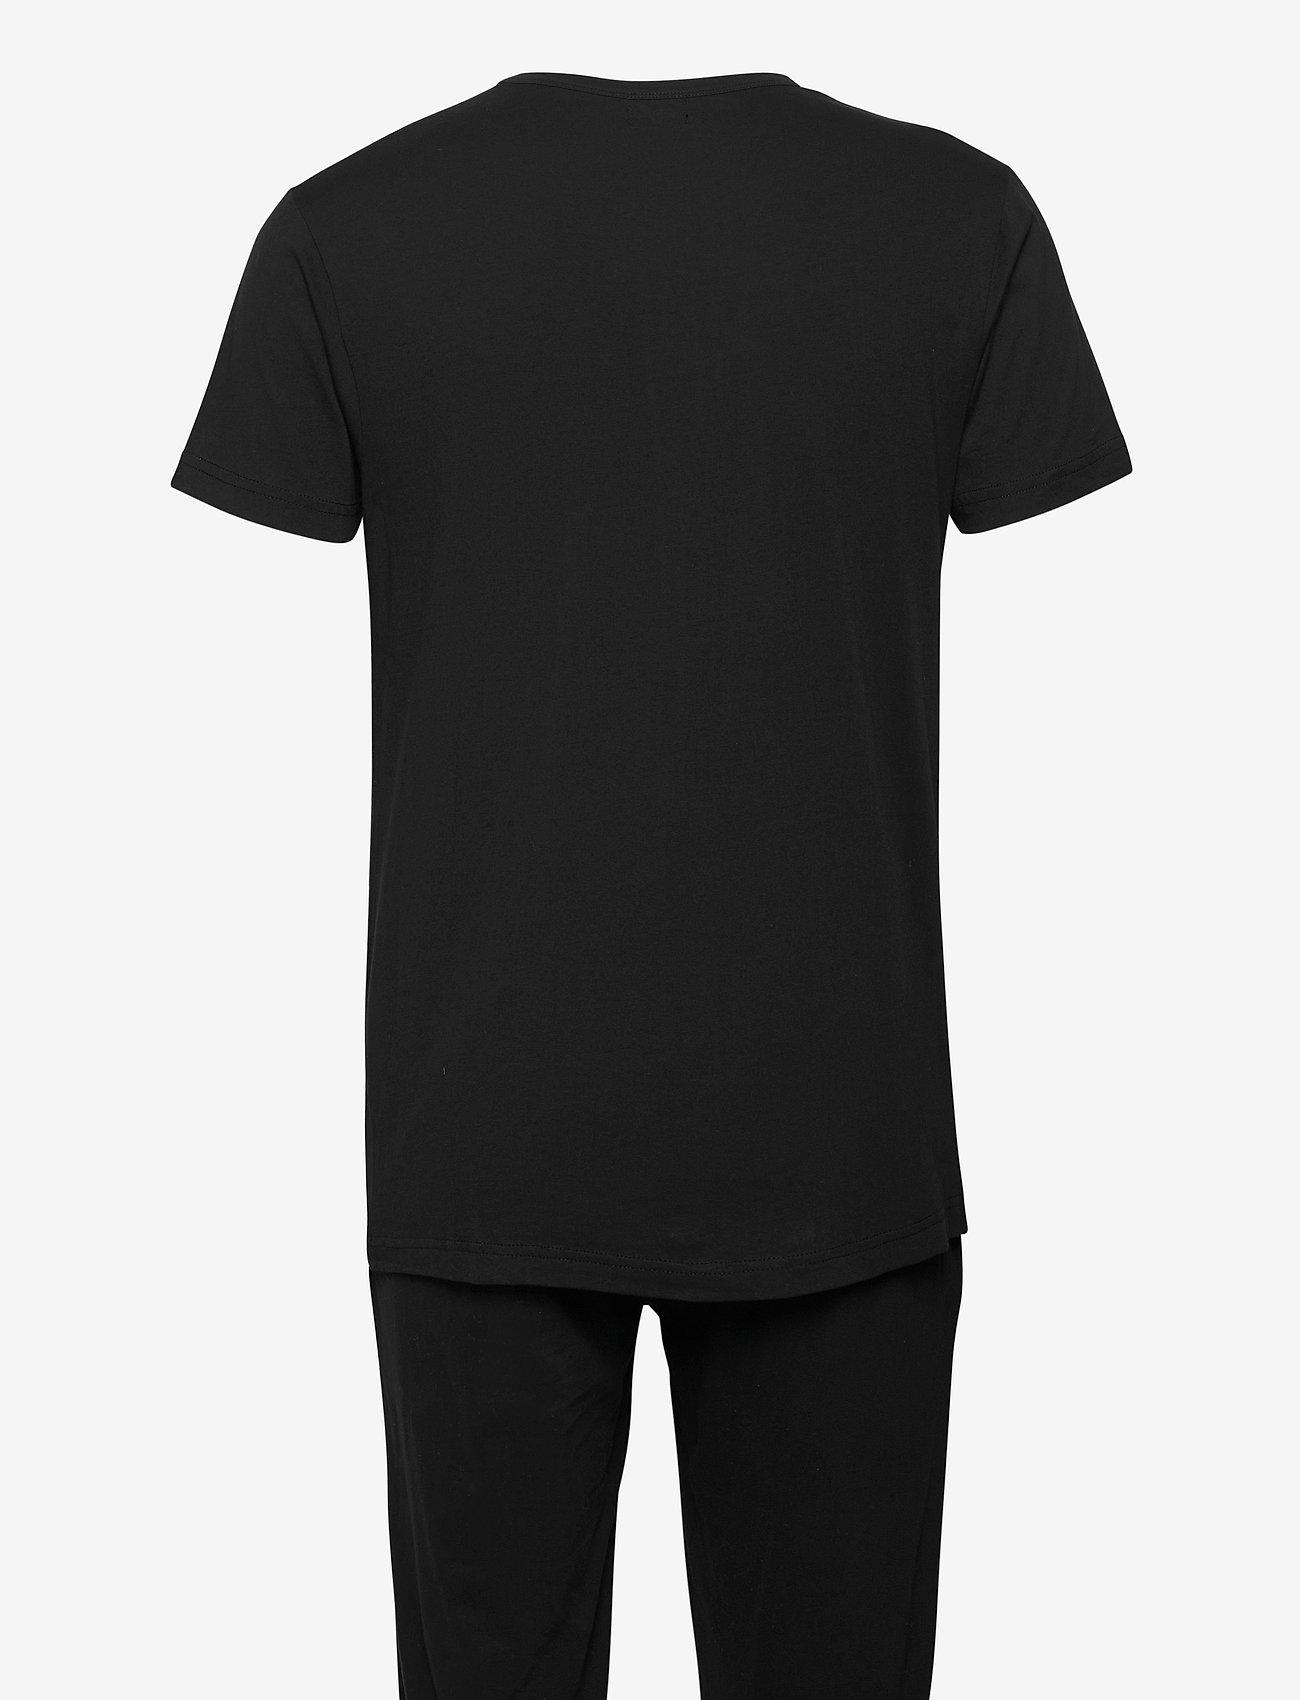 Lyle & Scott - BENJAMIN - pyjamas - black - 1